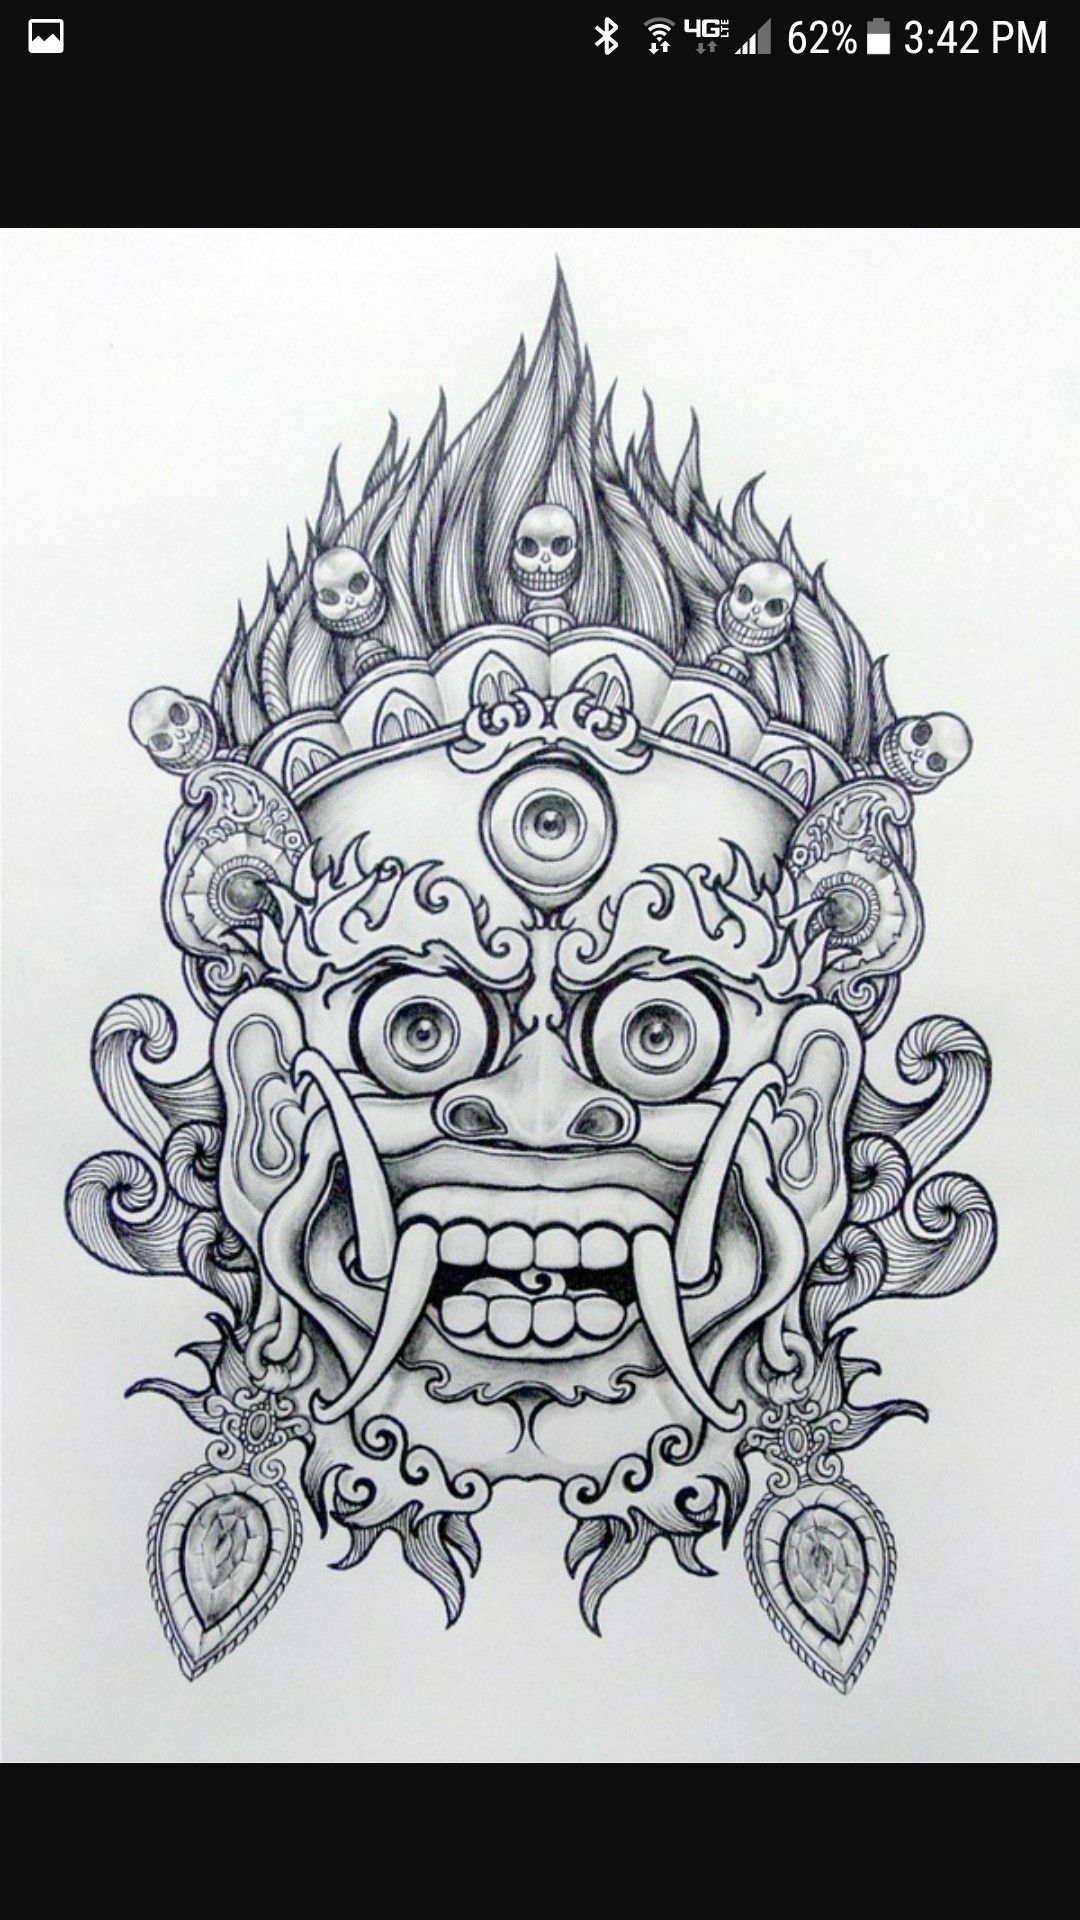 Pin By Kubaa Ah On Tattoo Tattoo Drawings Lion Tattoo Design Art Inspired Tattoos